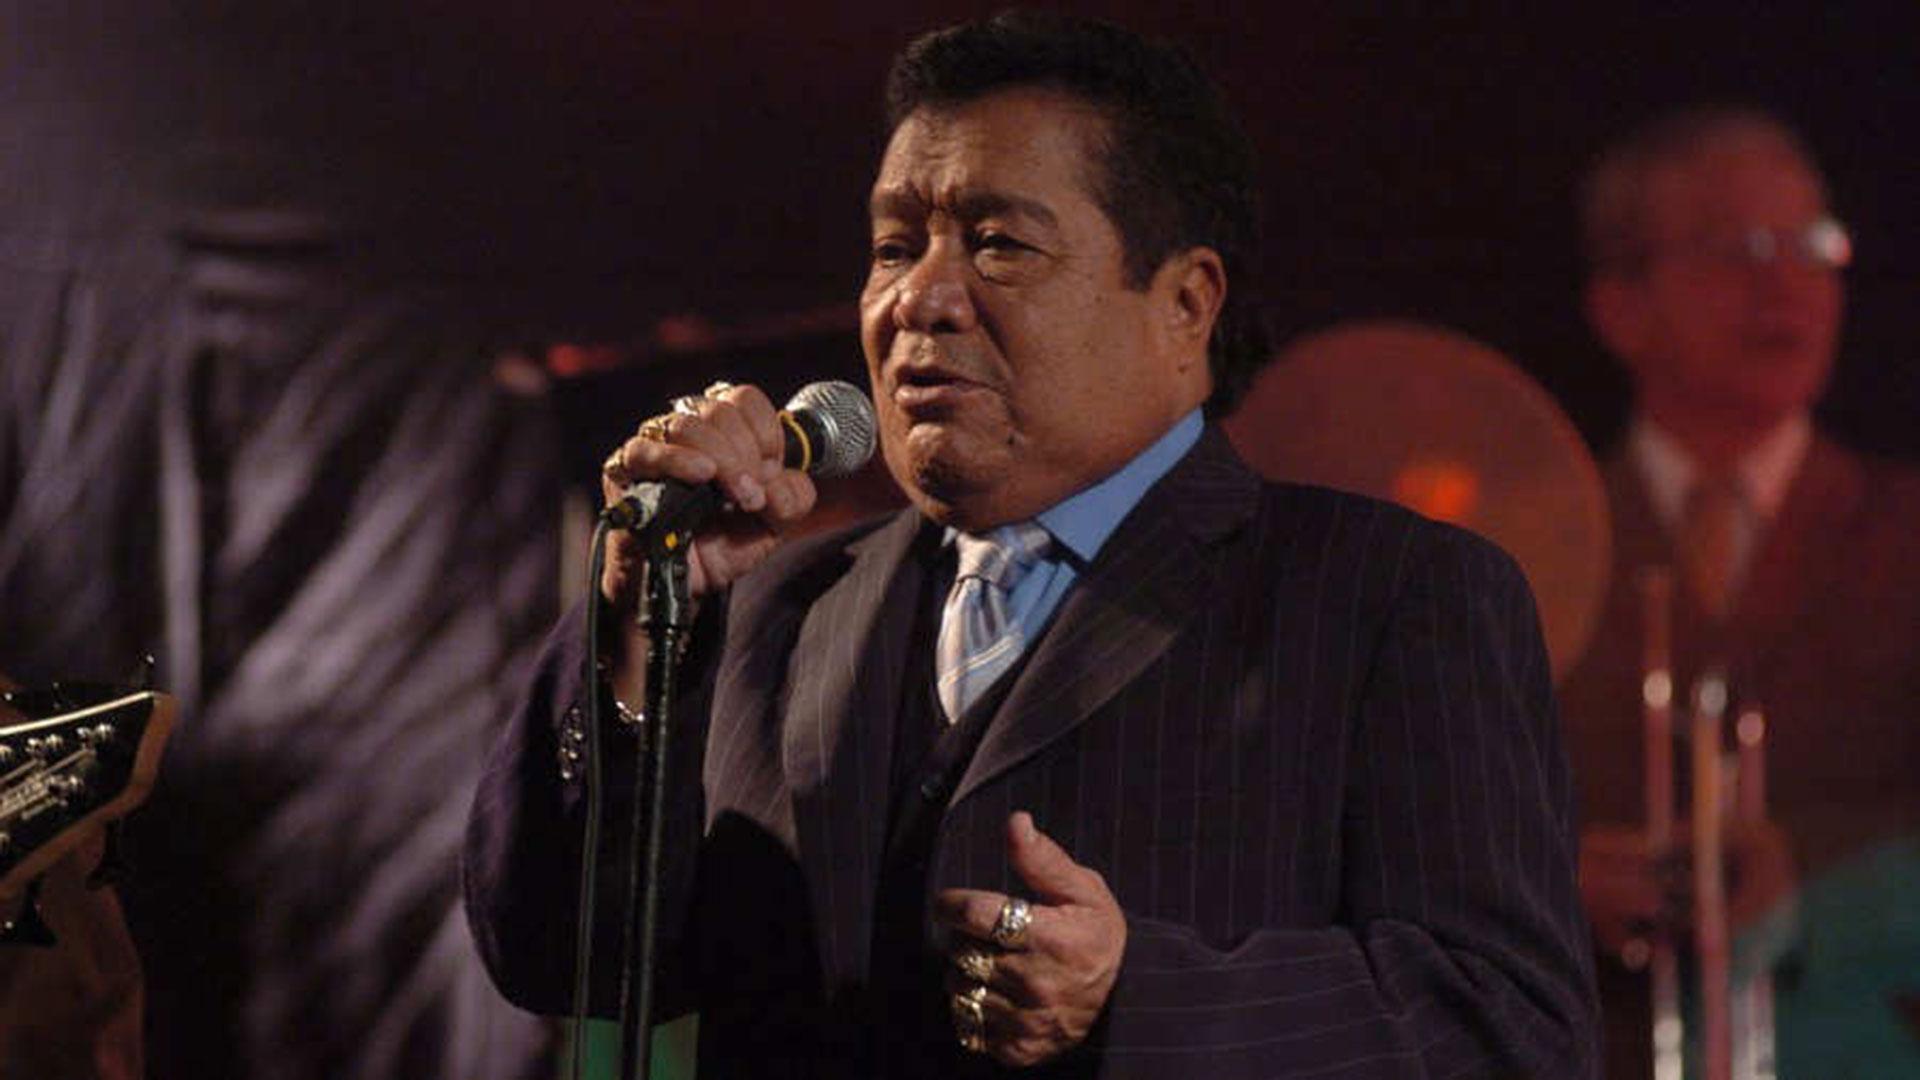 Pastor López - Pastor López